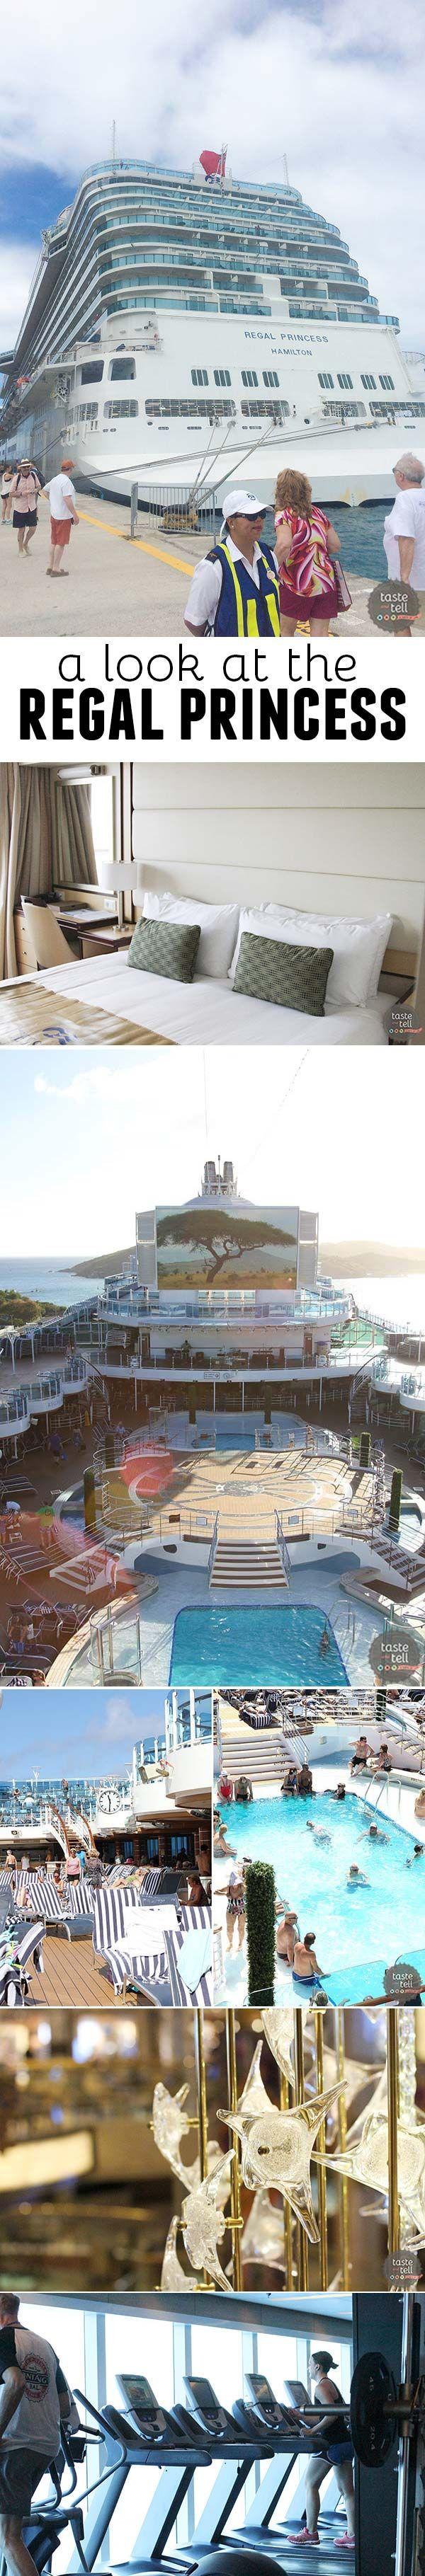 A look at the Regal Princess, from Princess Cruises